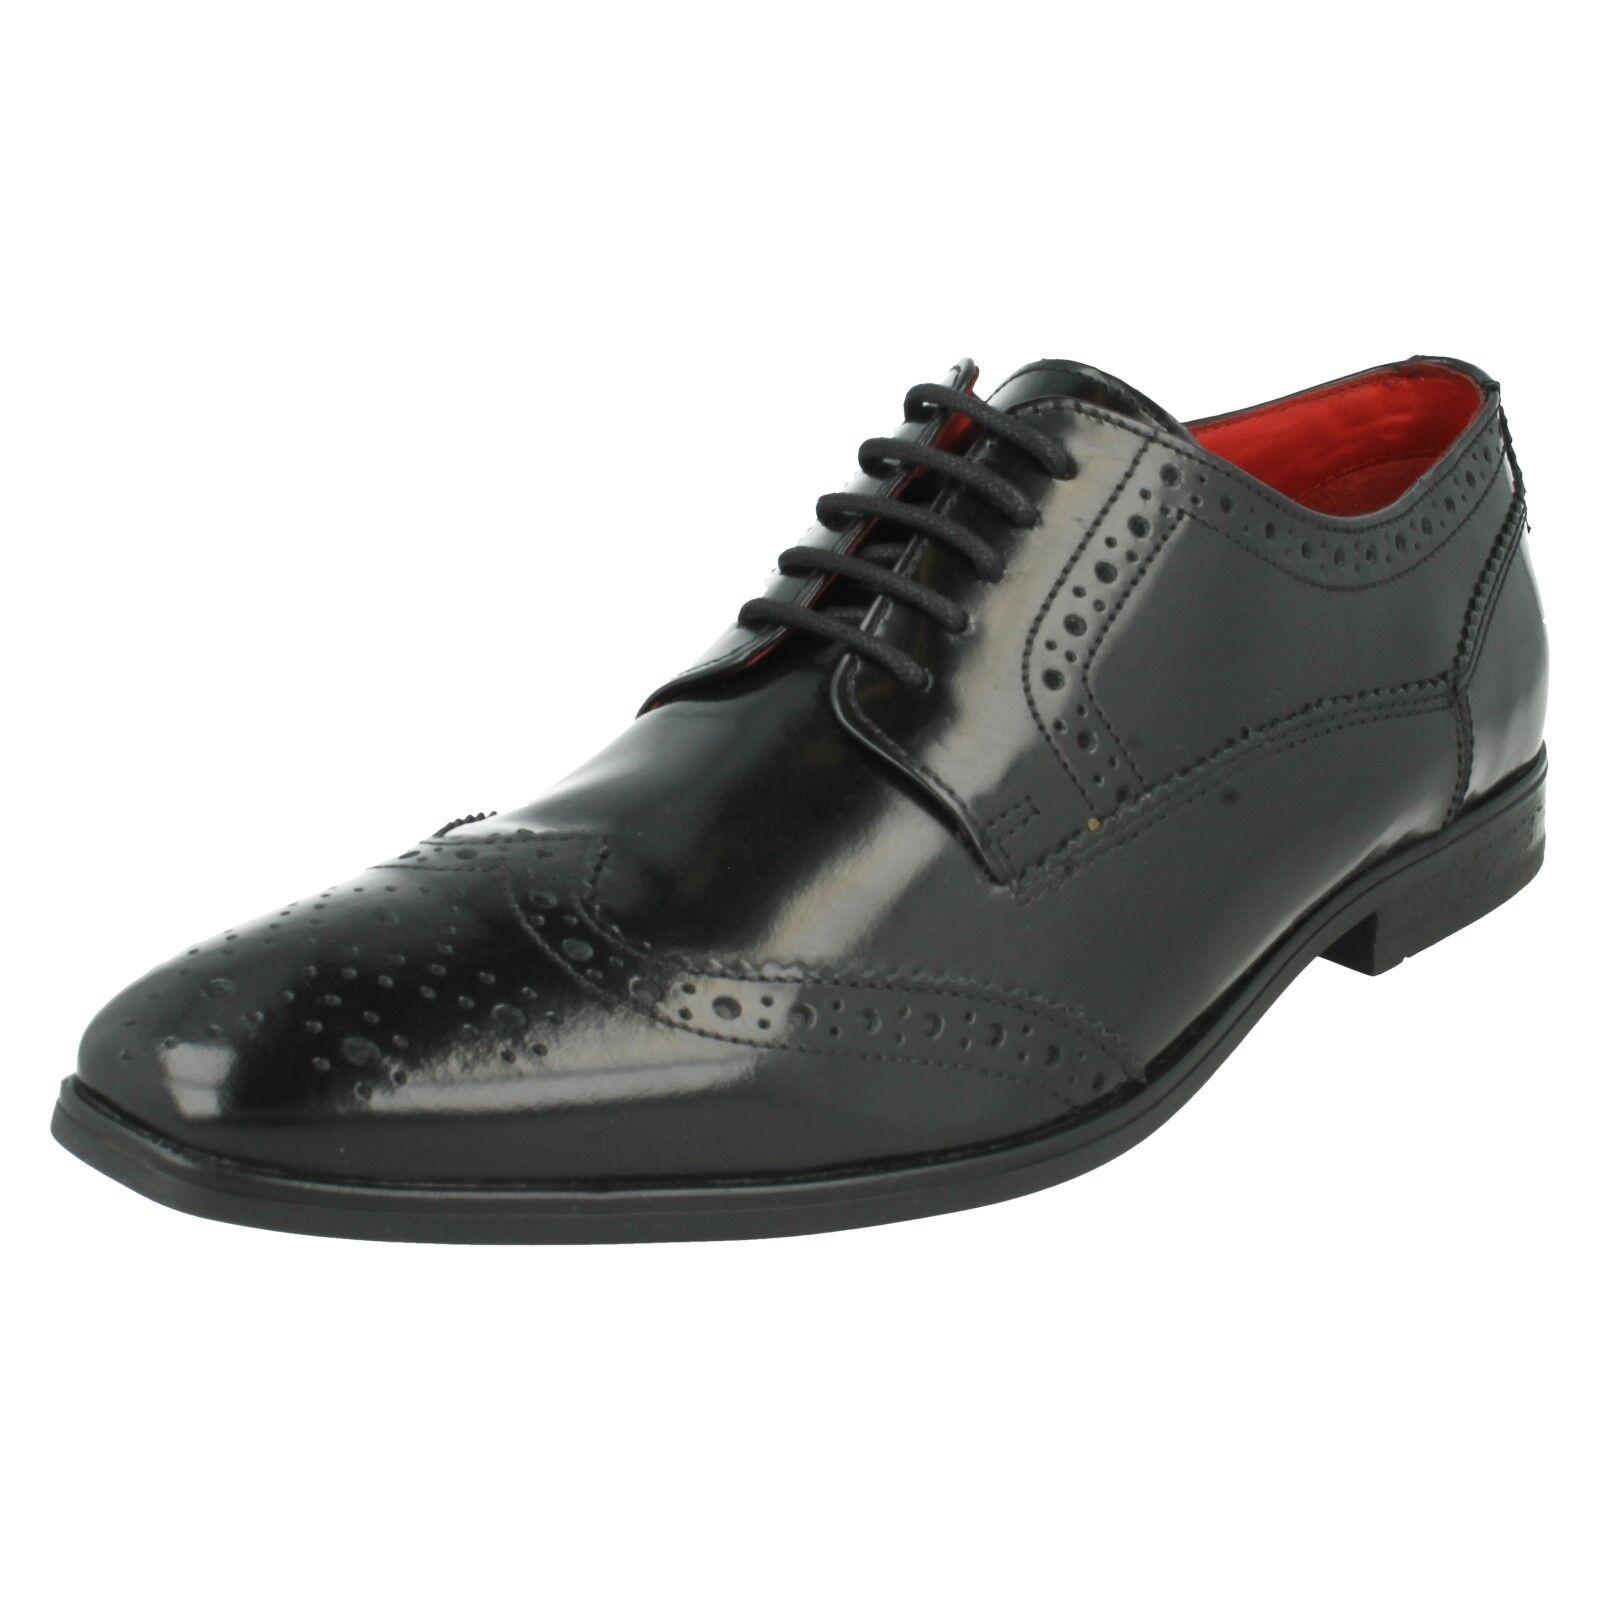 Hombre Base London Formal Lace Up Brogues Formal London Zapatos *Harold* b2a425